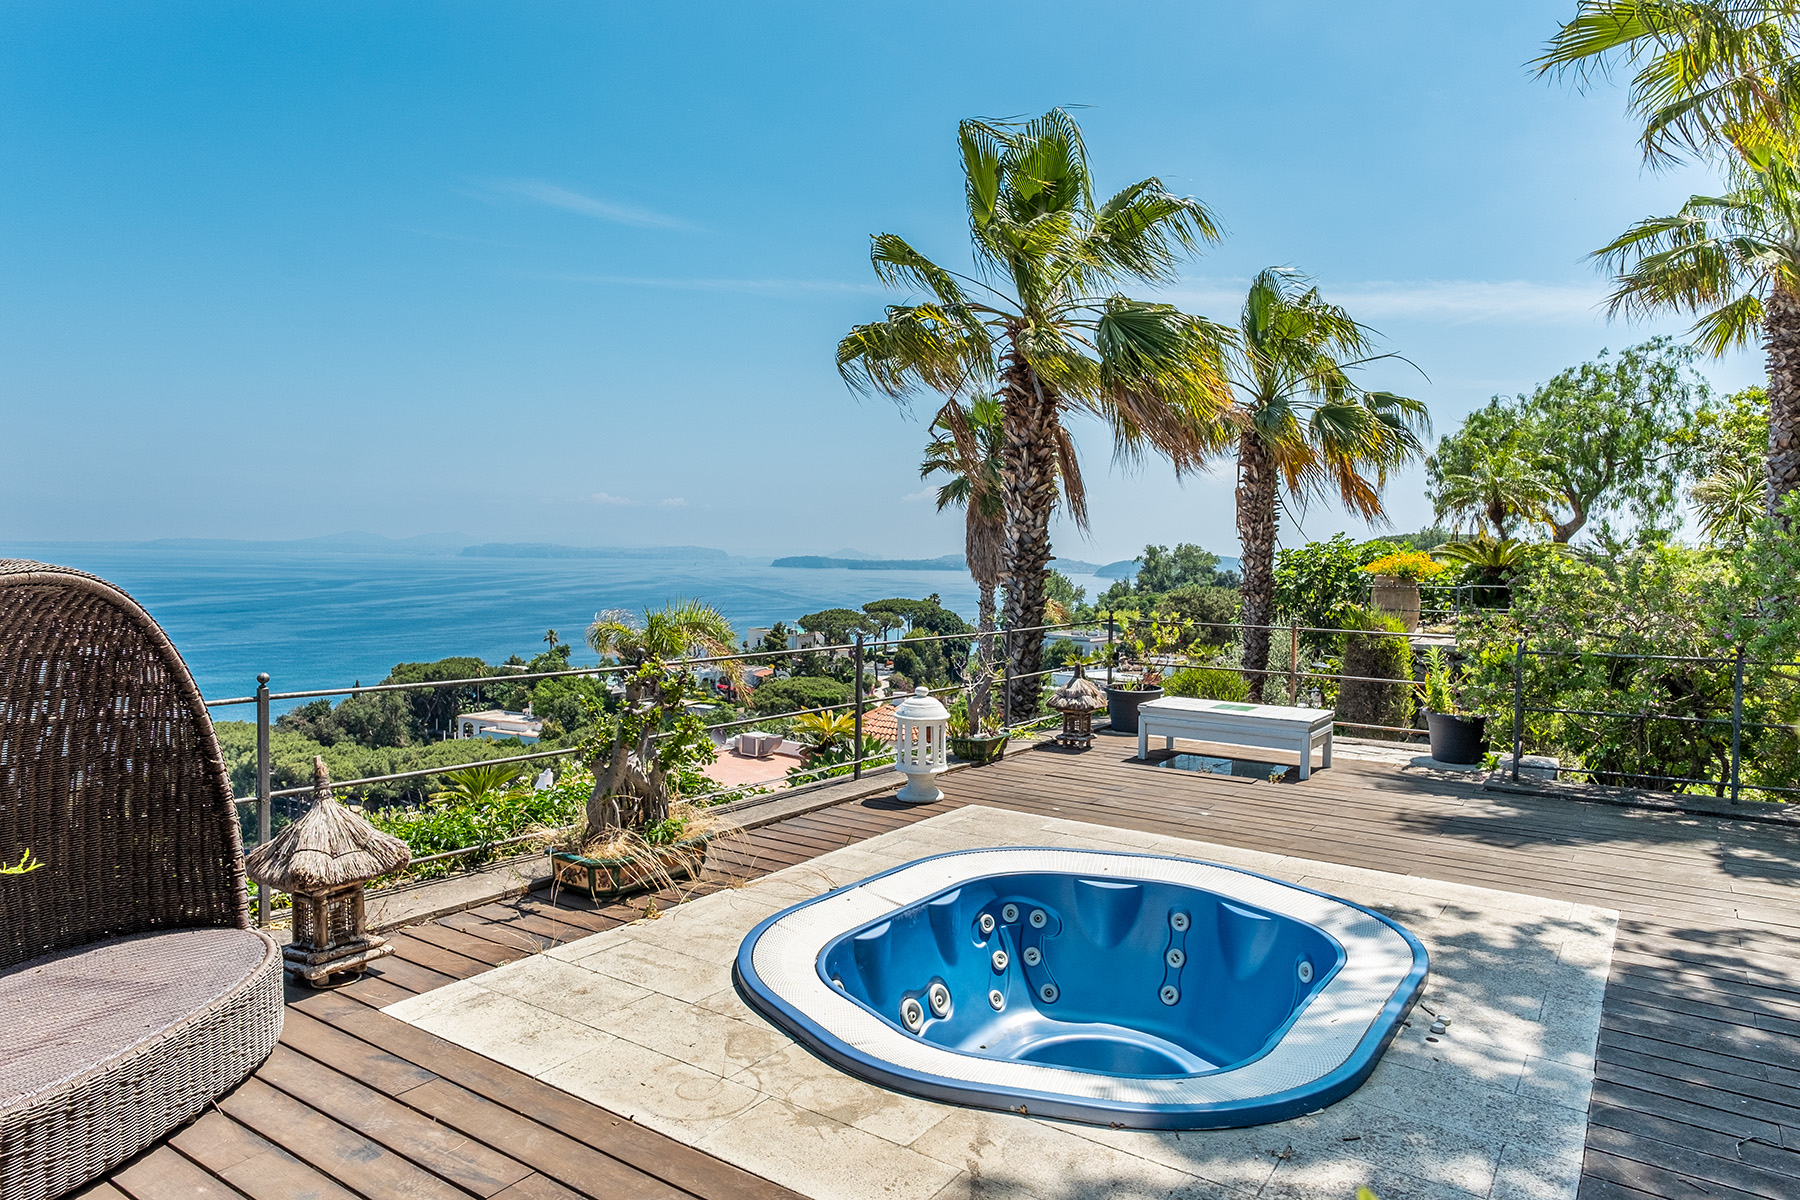 Villa in Vendita a Ischia: 5 locali, 500 mq - Foto 22